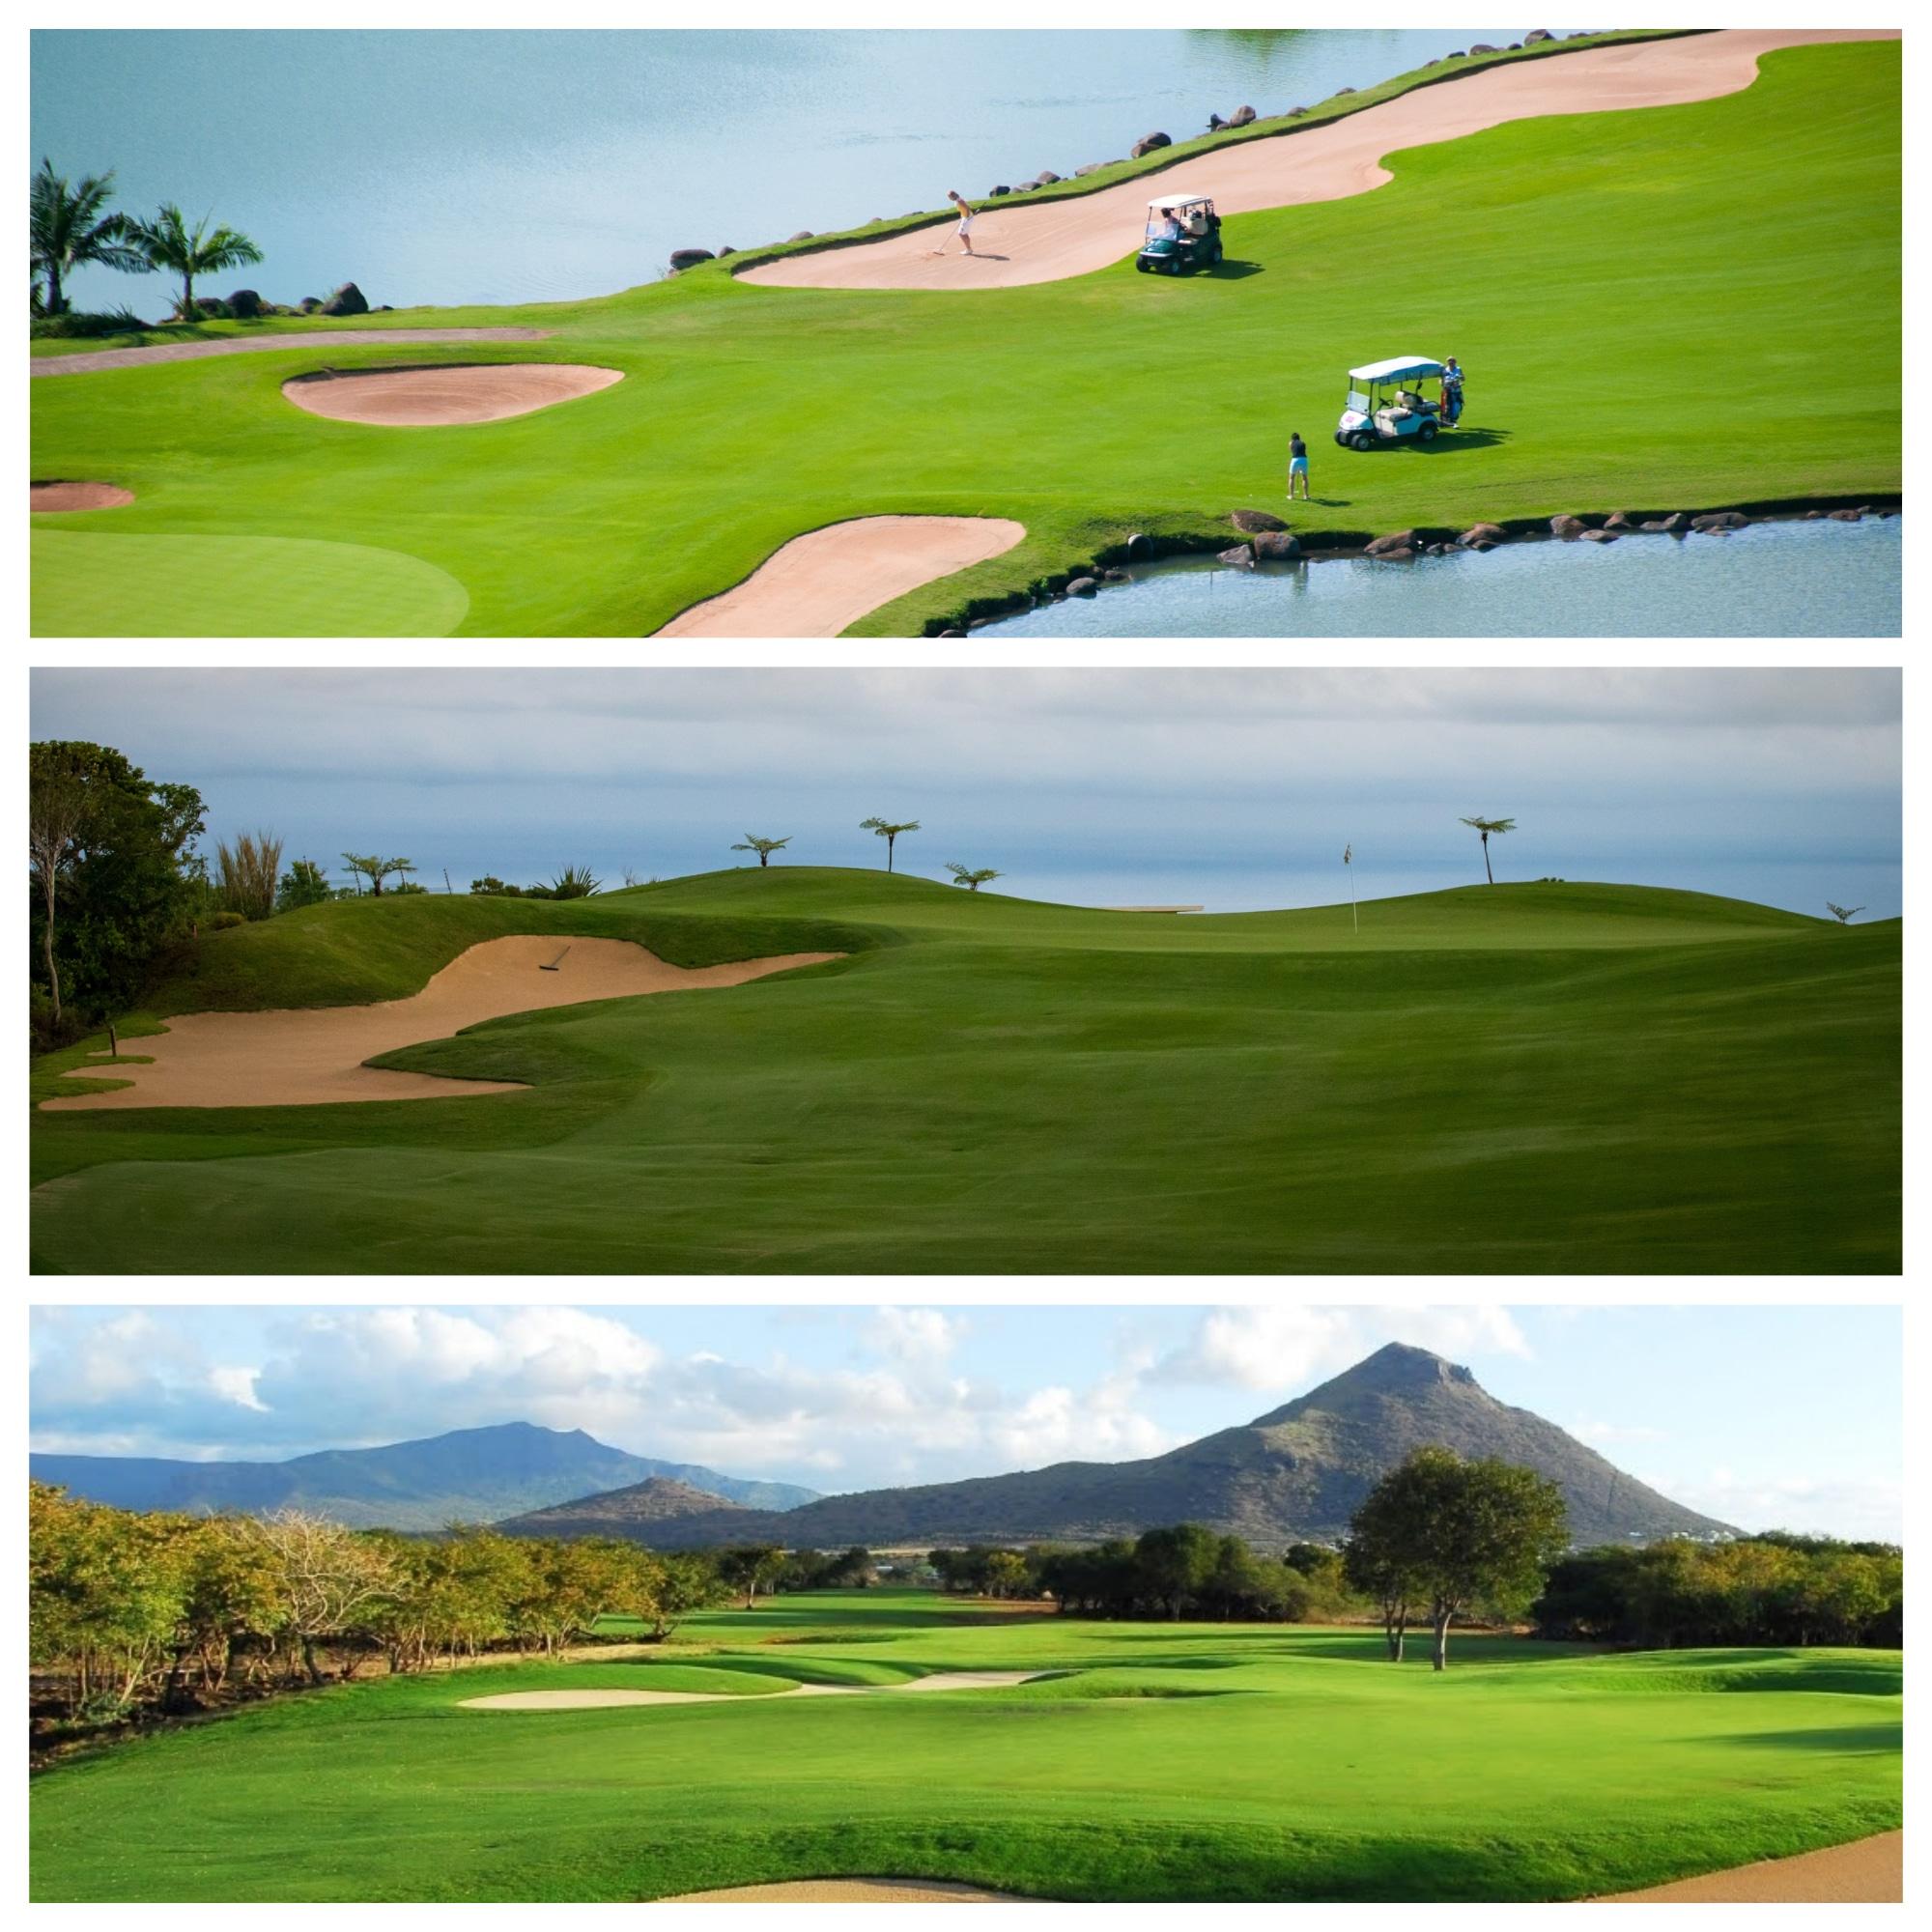 Heritage, Avalon, Tamarina Golf Club